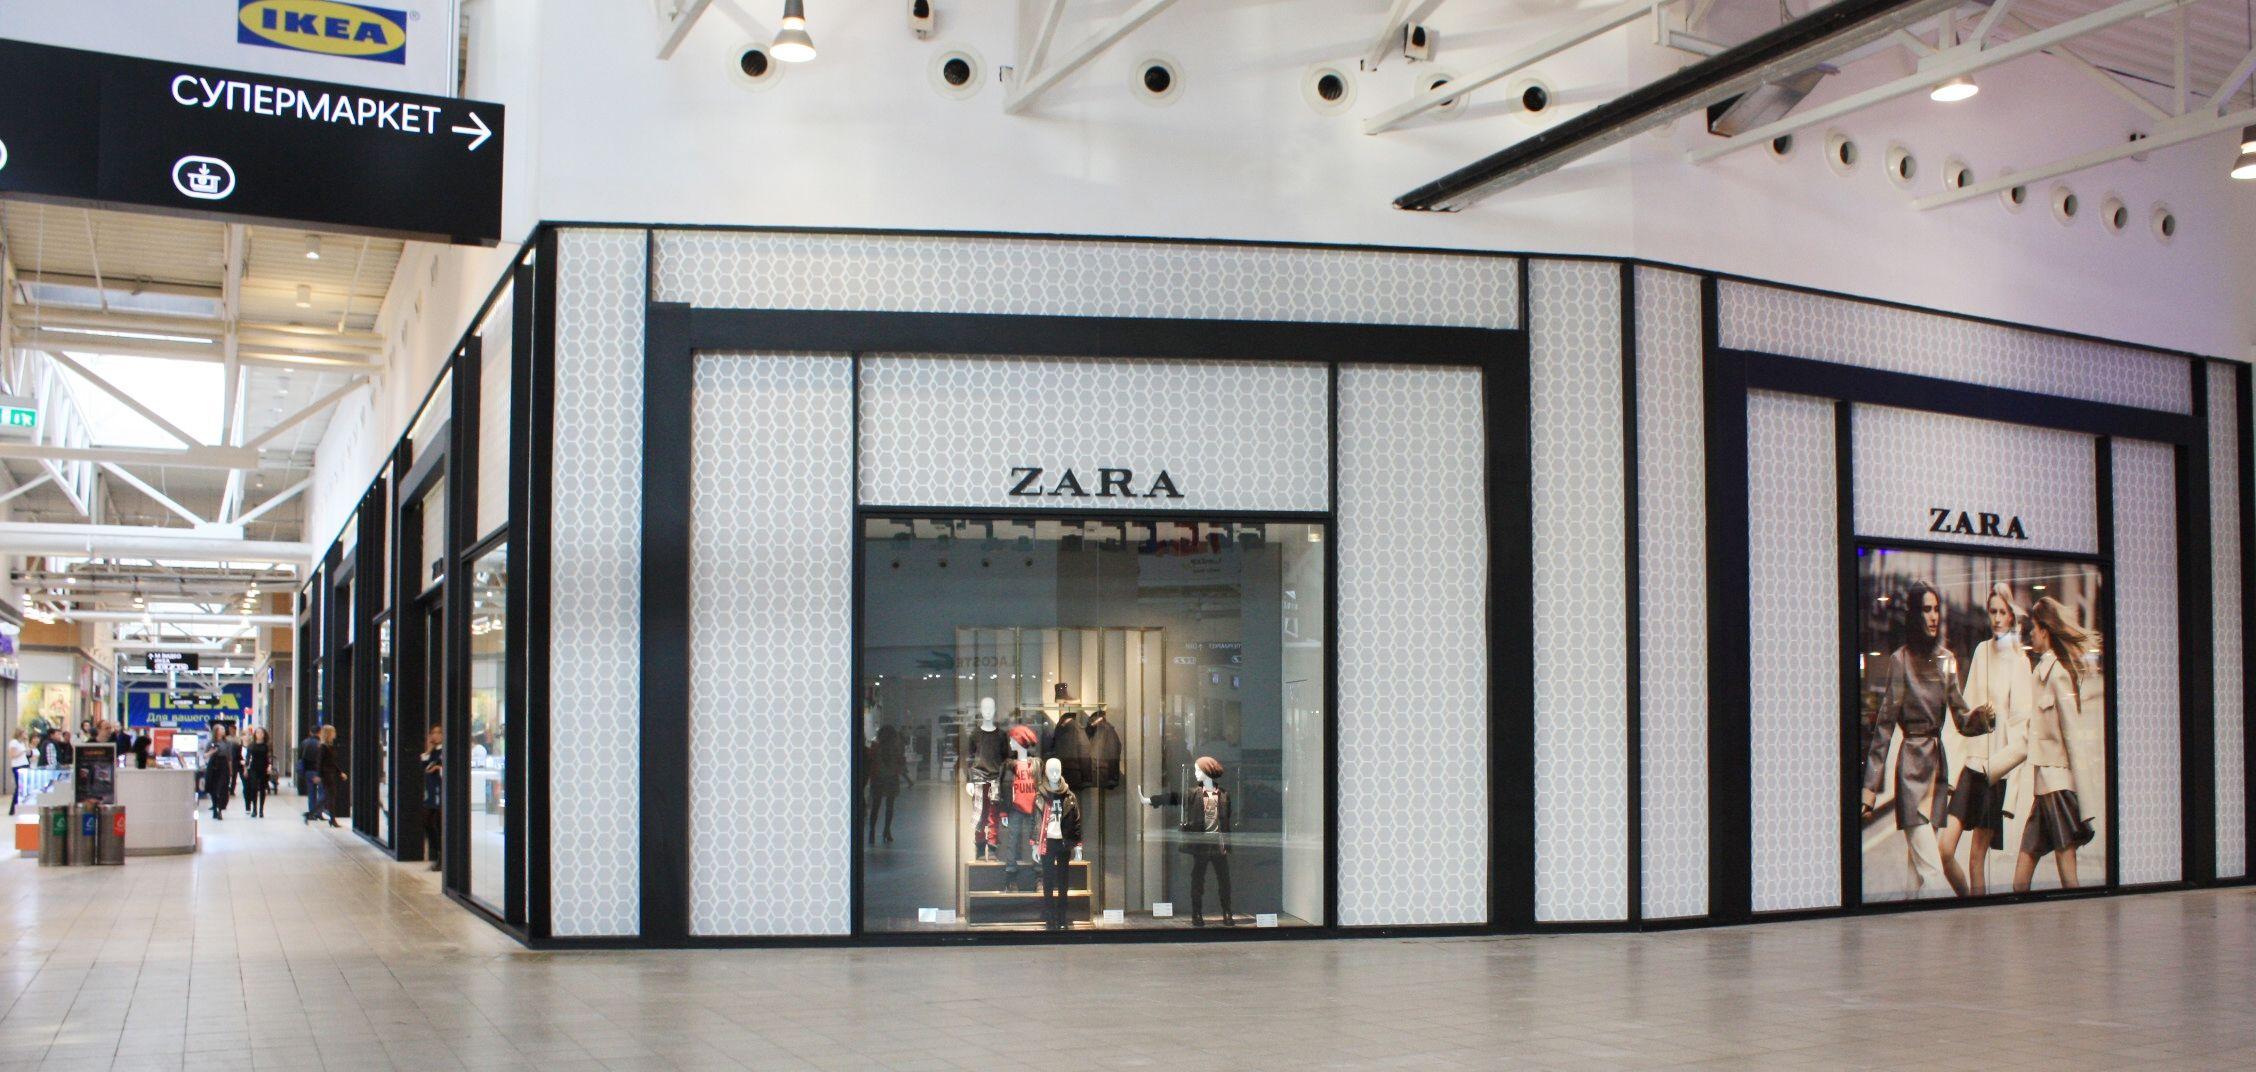 zara amazing logistics Zara's thorough logistics and scheduling feed into the supply chain and distribution rhythm raw materials  natasha, this is amazing.